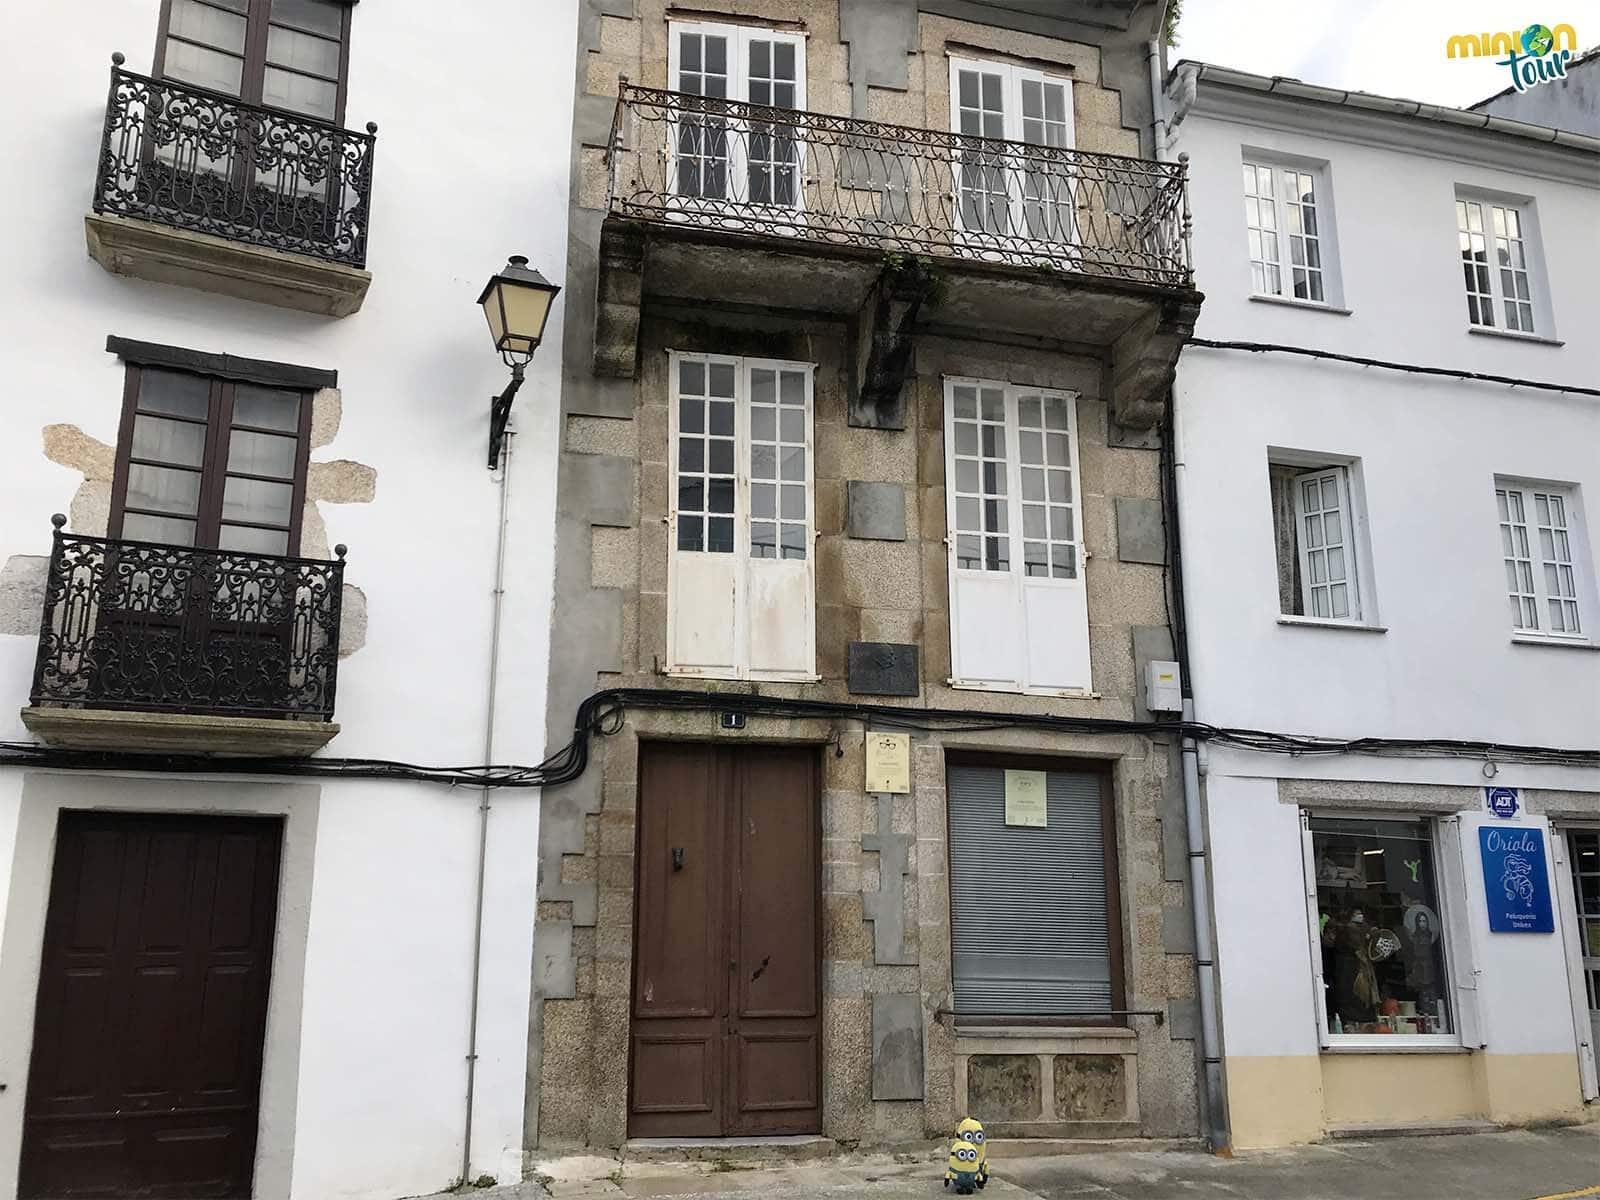 Esta es la casa en la que nació Álvaro Cunqueiro